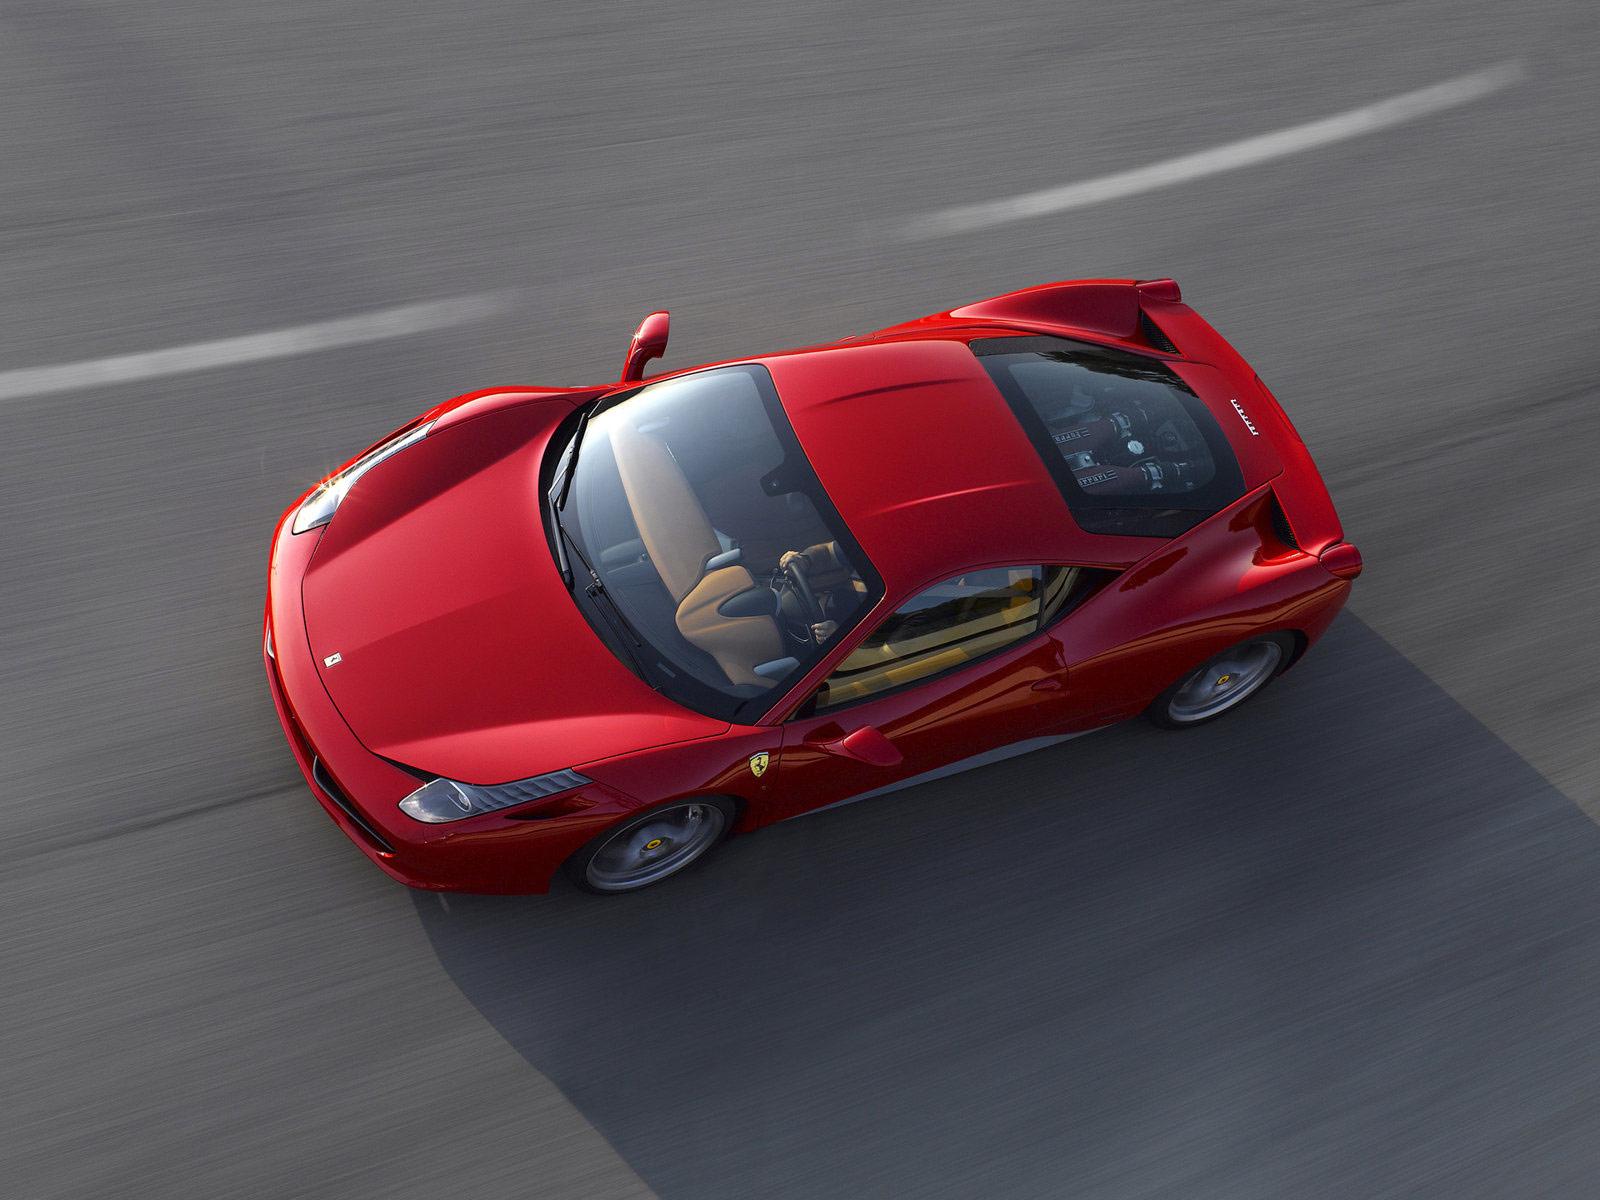 Gambar Mobil Ferrari 458 Italia 2011